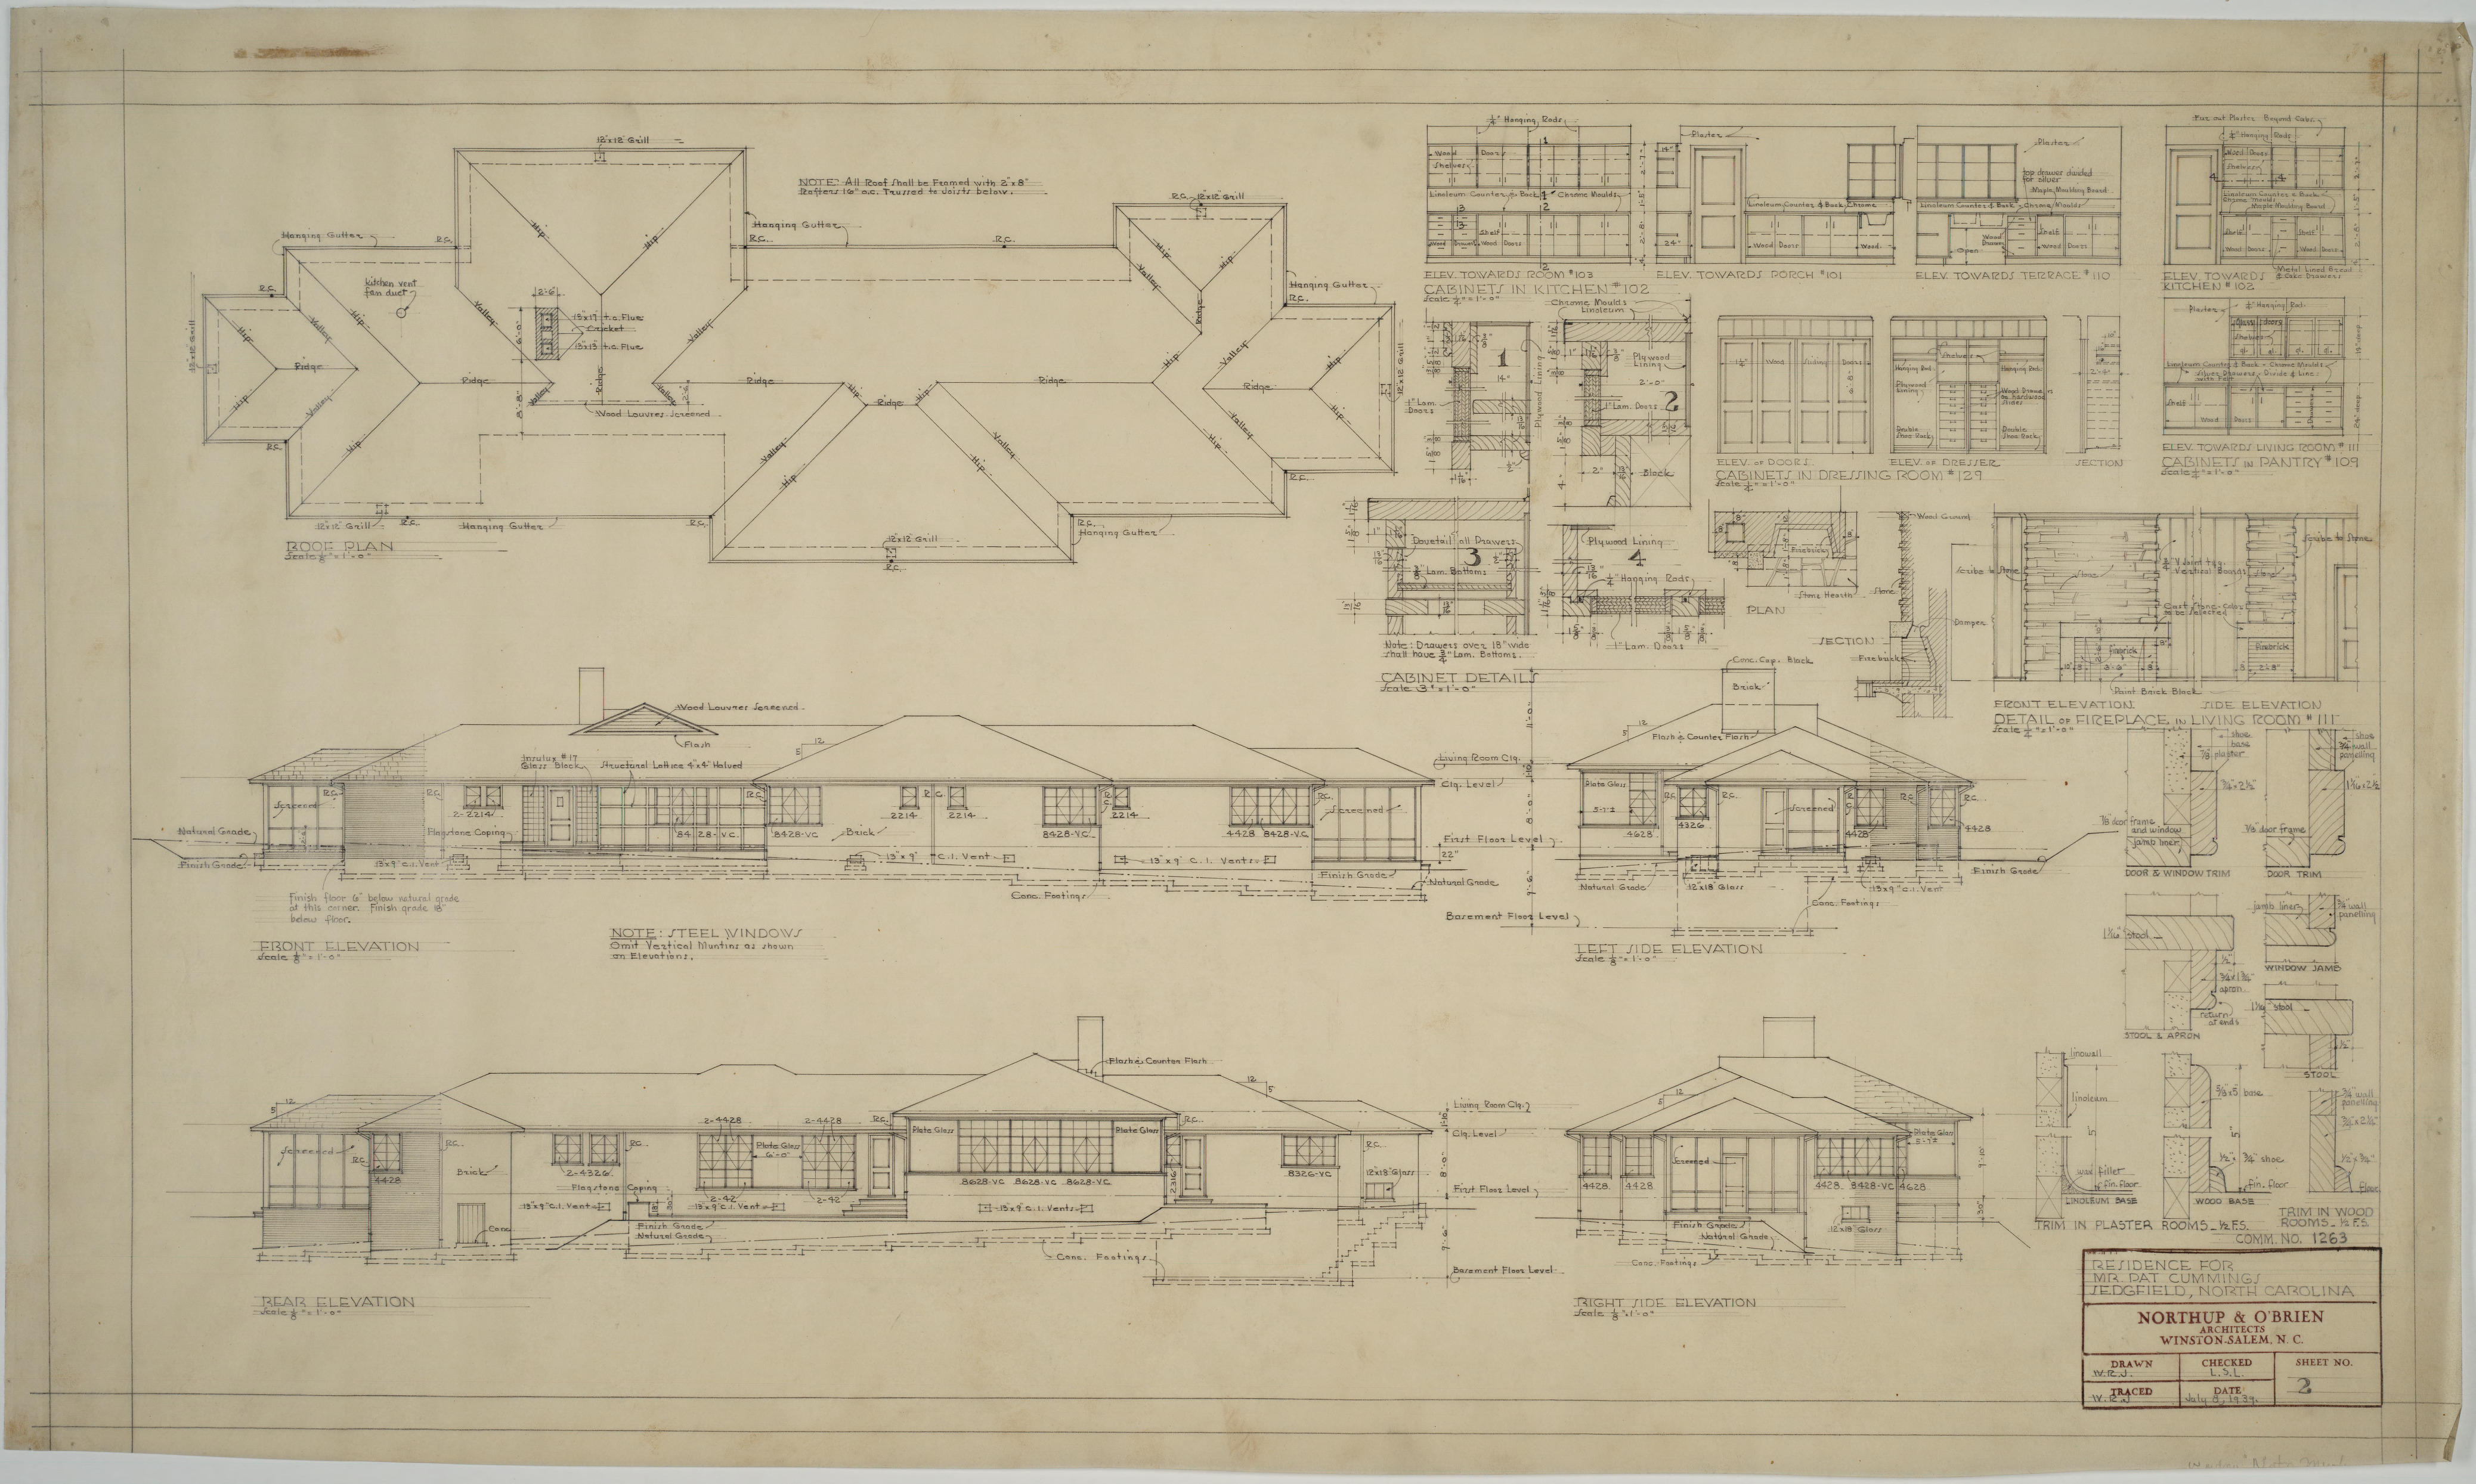 Right Side Elevation Plan : Roof plan front elevation left side rear